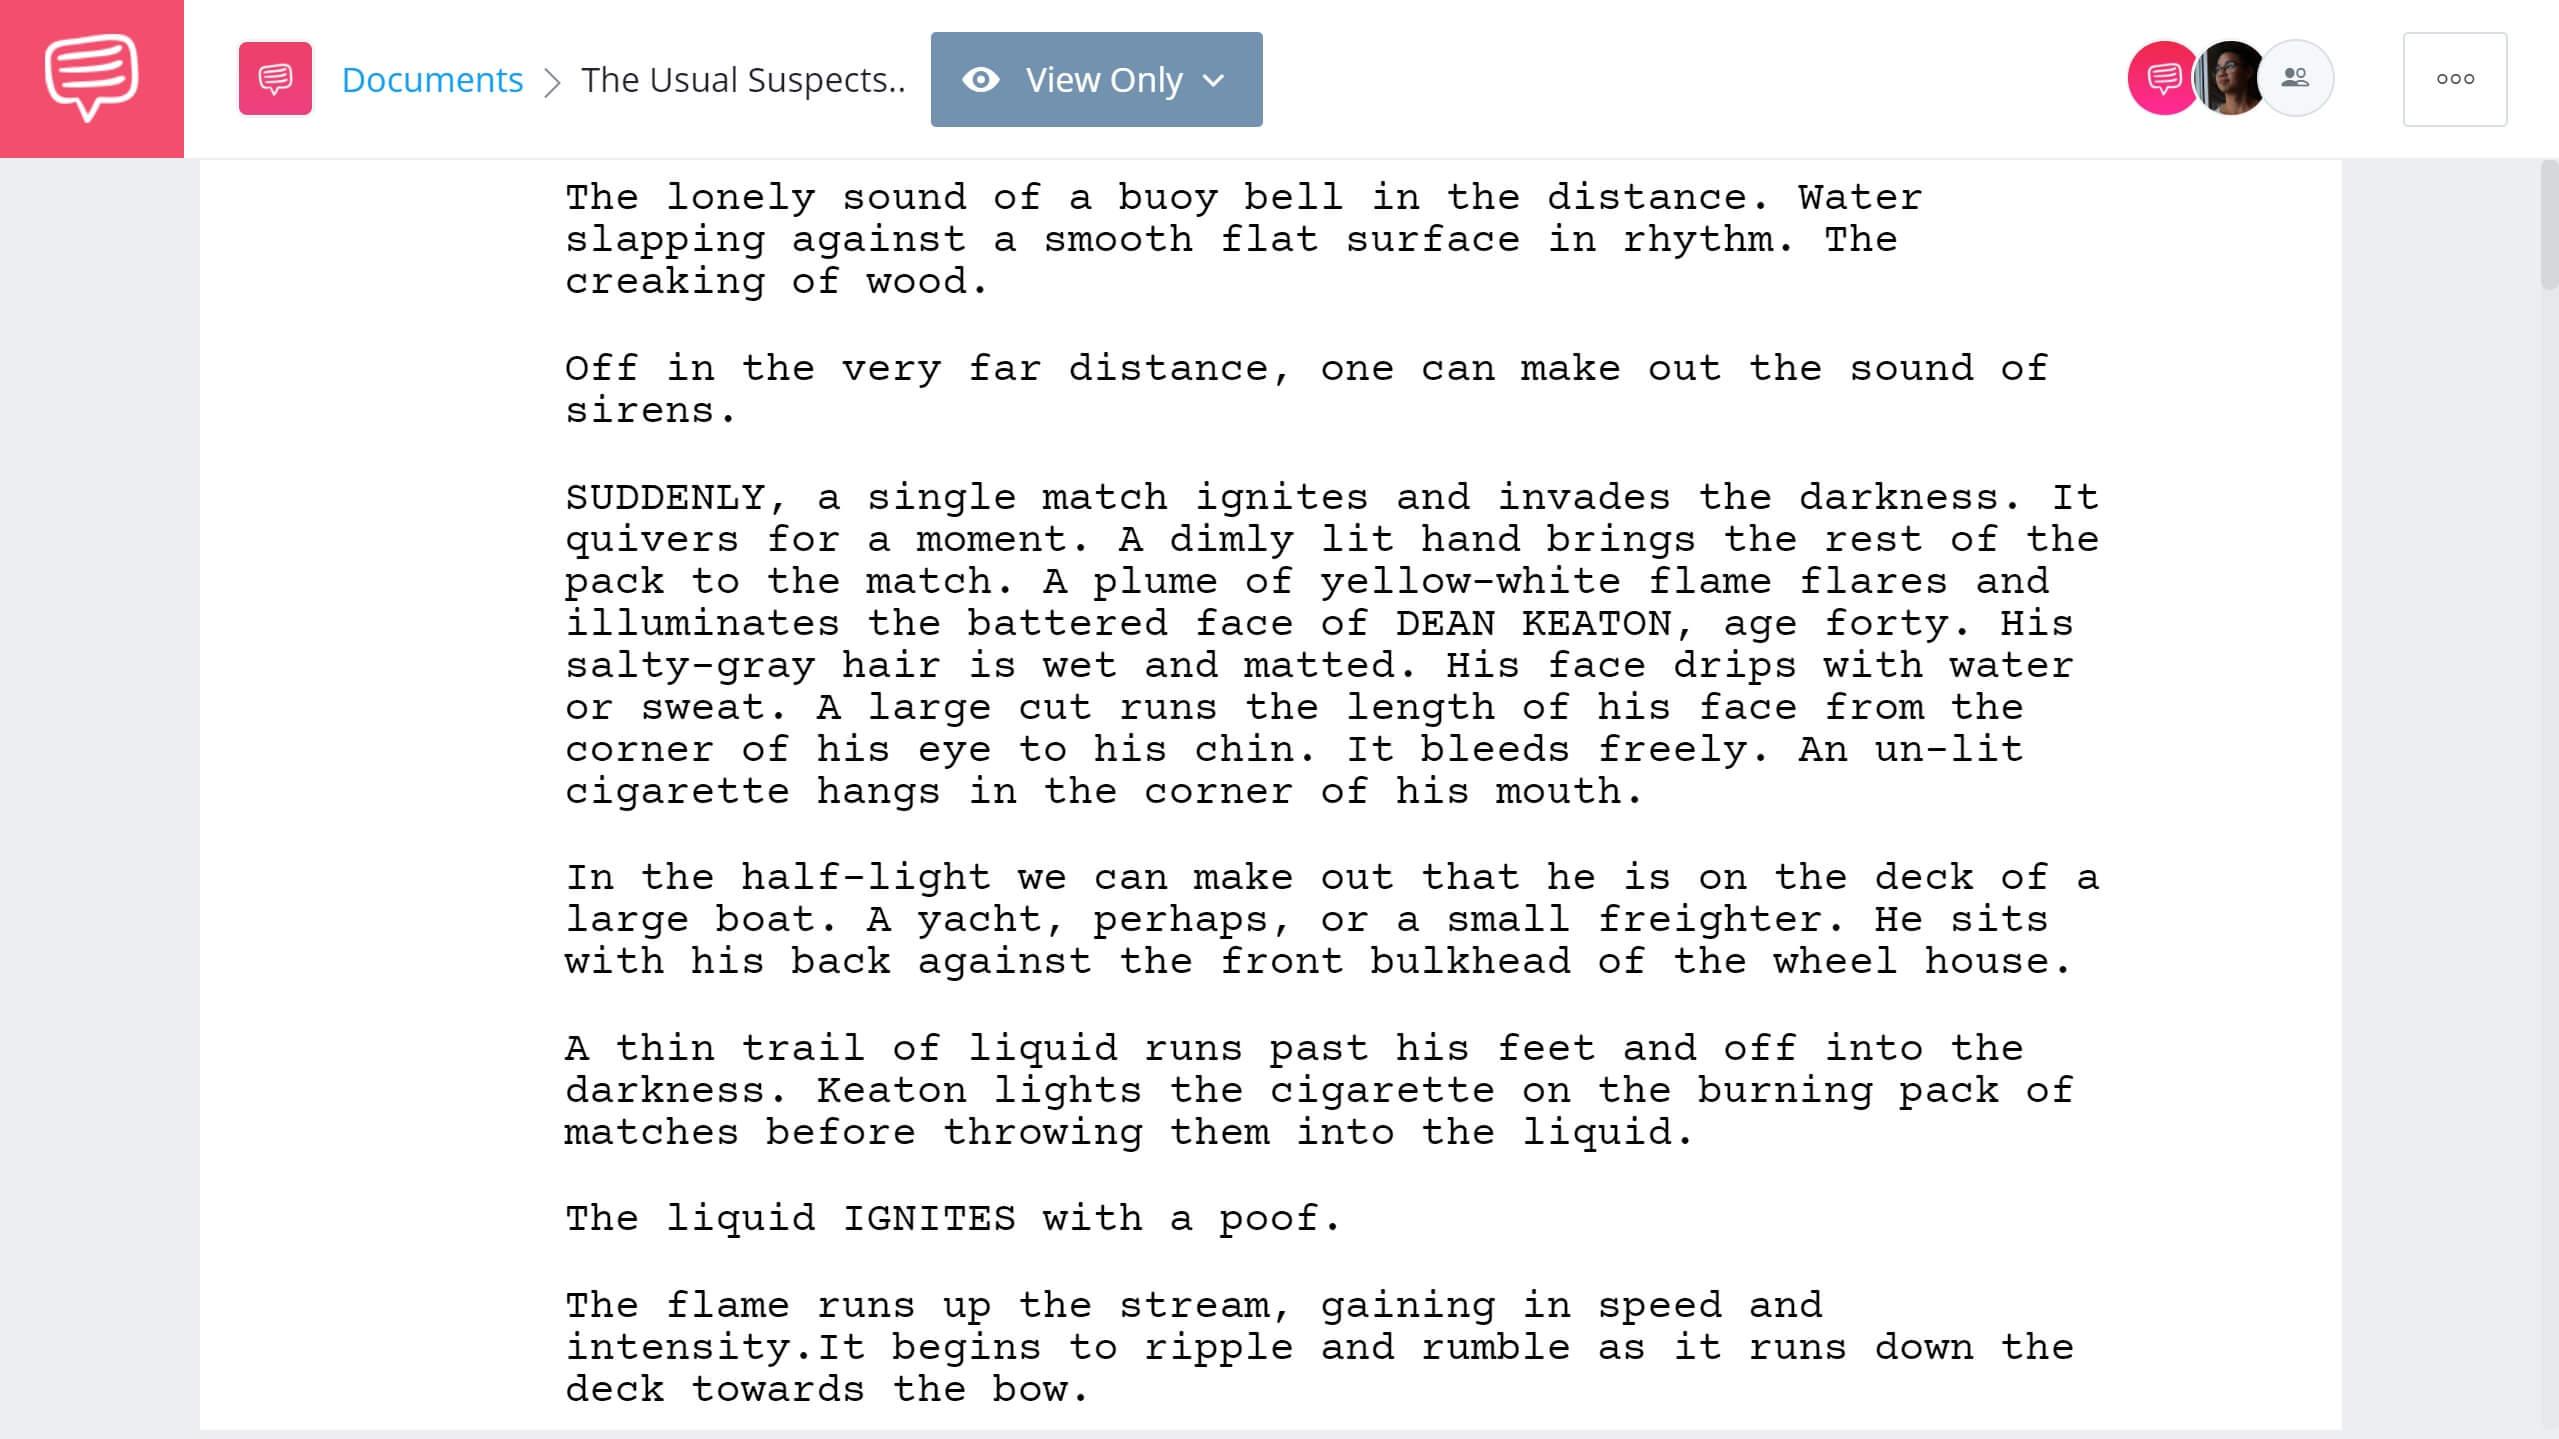 Best Original Screenplay Academy Award - The Usual Suspects Full Script PDF Download - StudioBinder Screenwriting Software